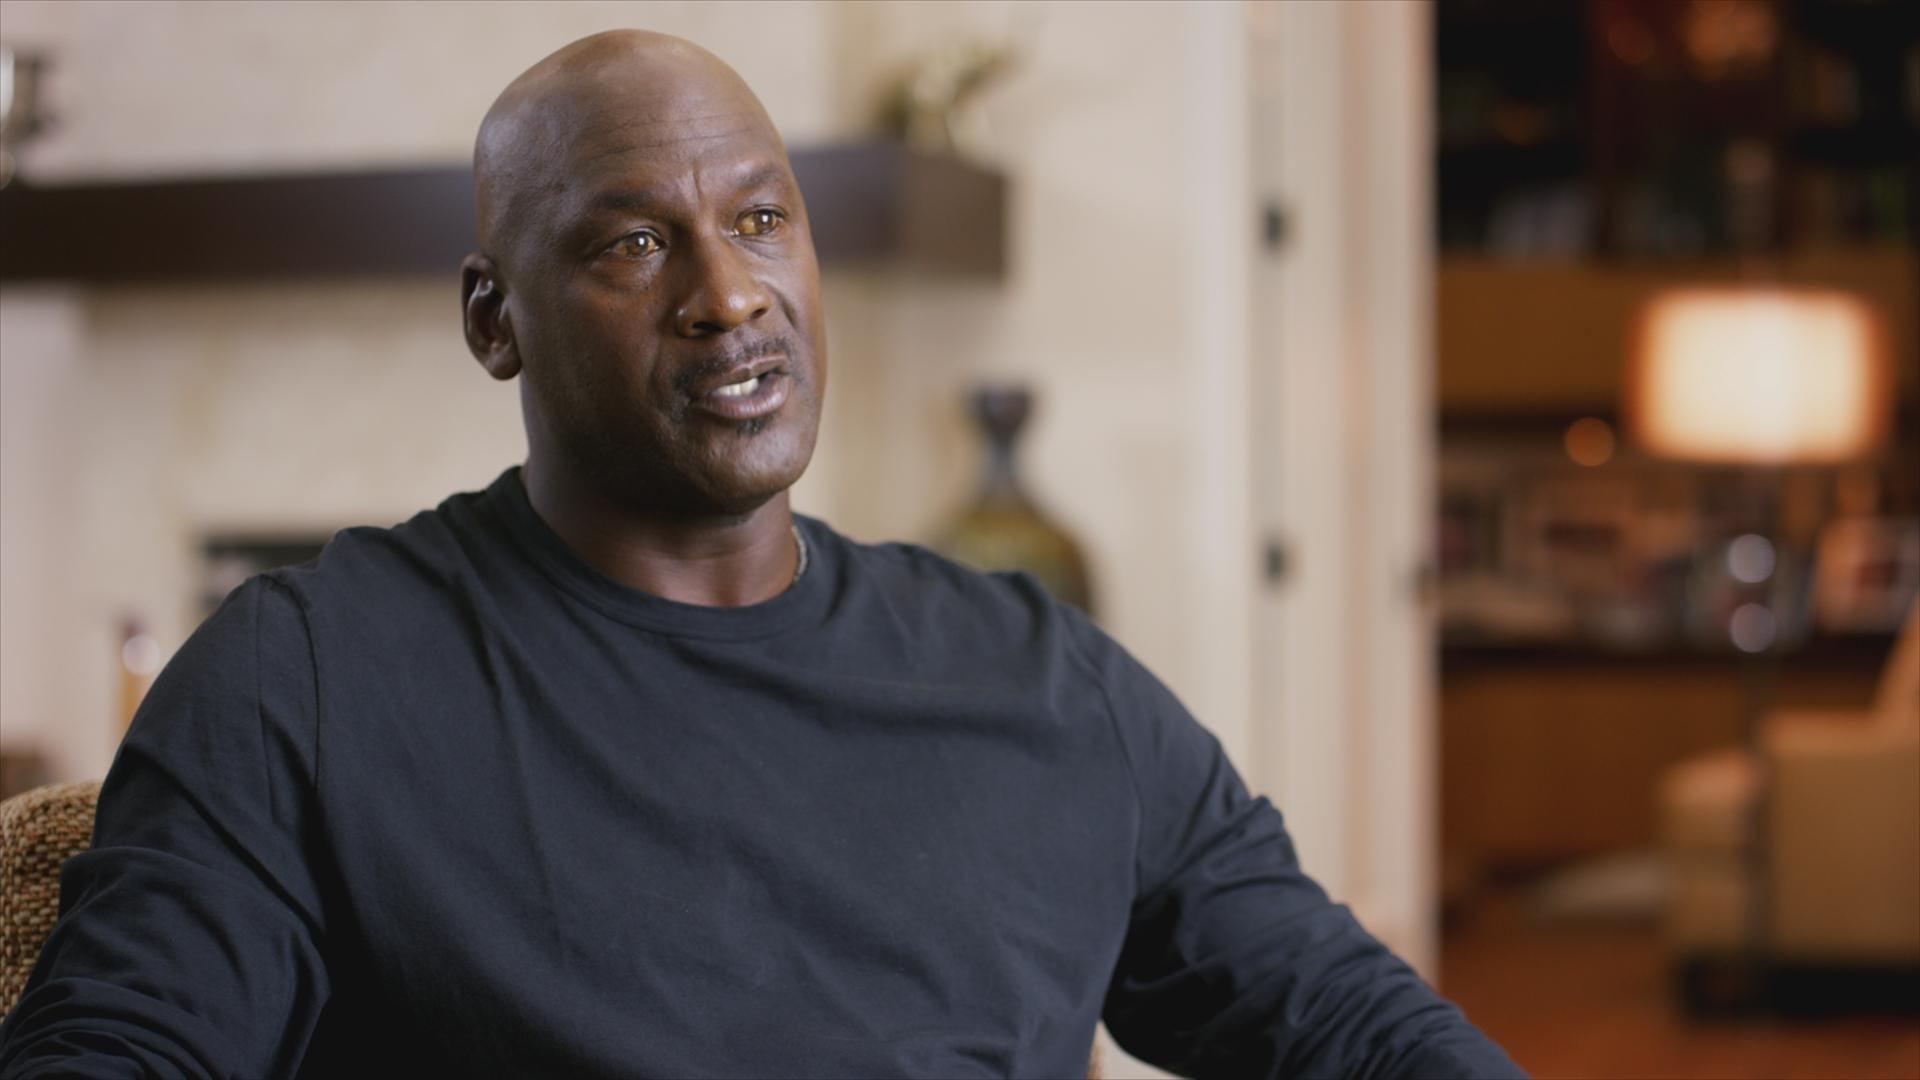 THE LAST DANCE, Michael Jordan, (premiered Apr. 19, 2020). photo: ESPN/Netflix / Courtesy Everett Collection